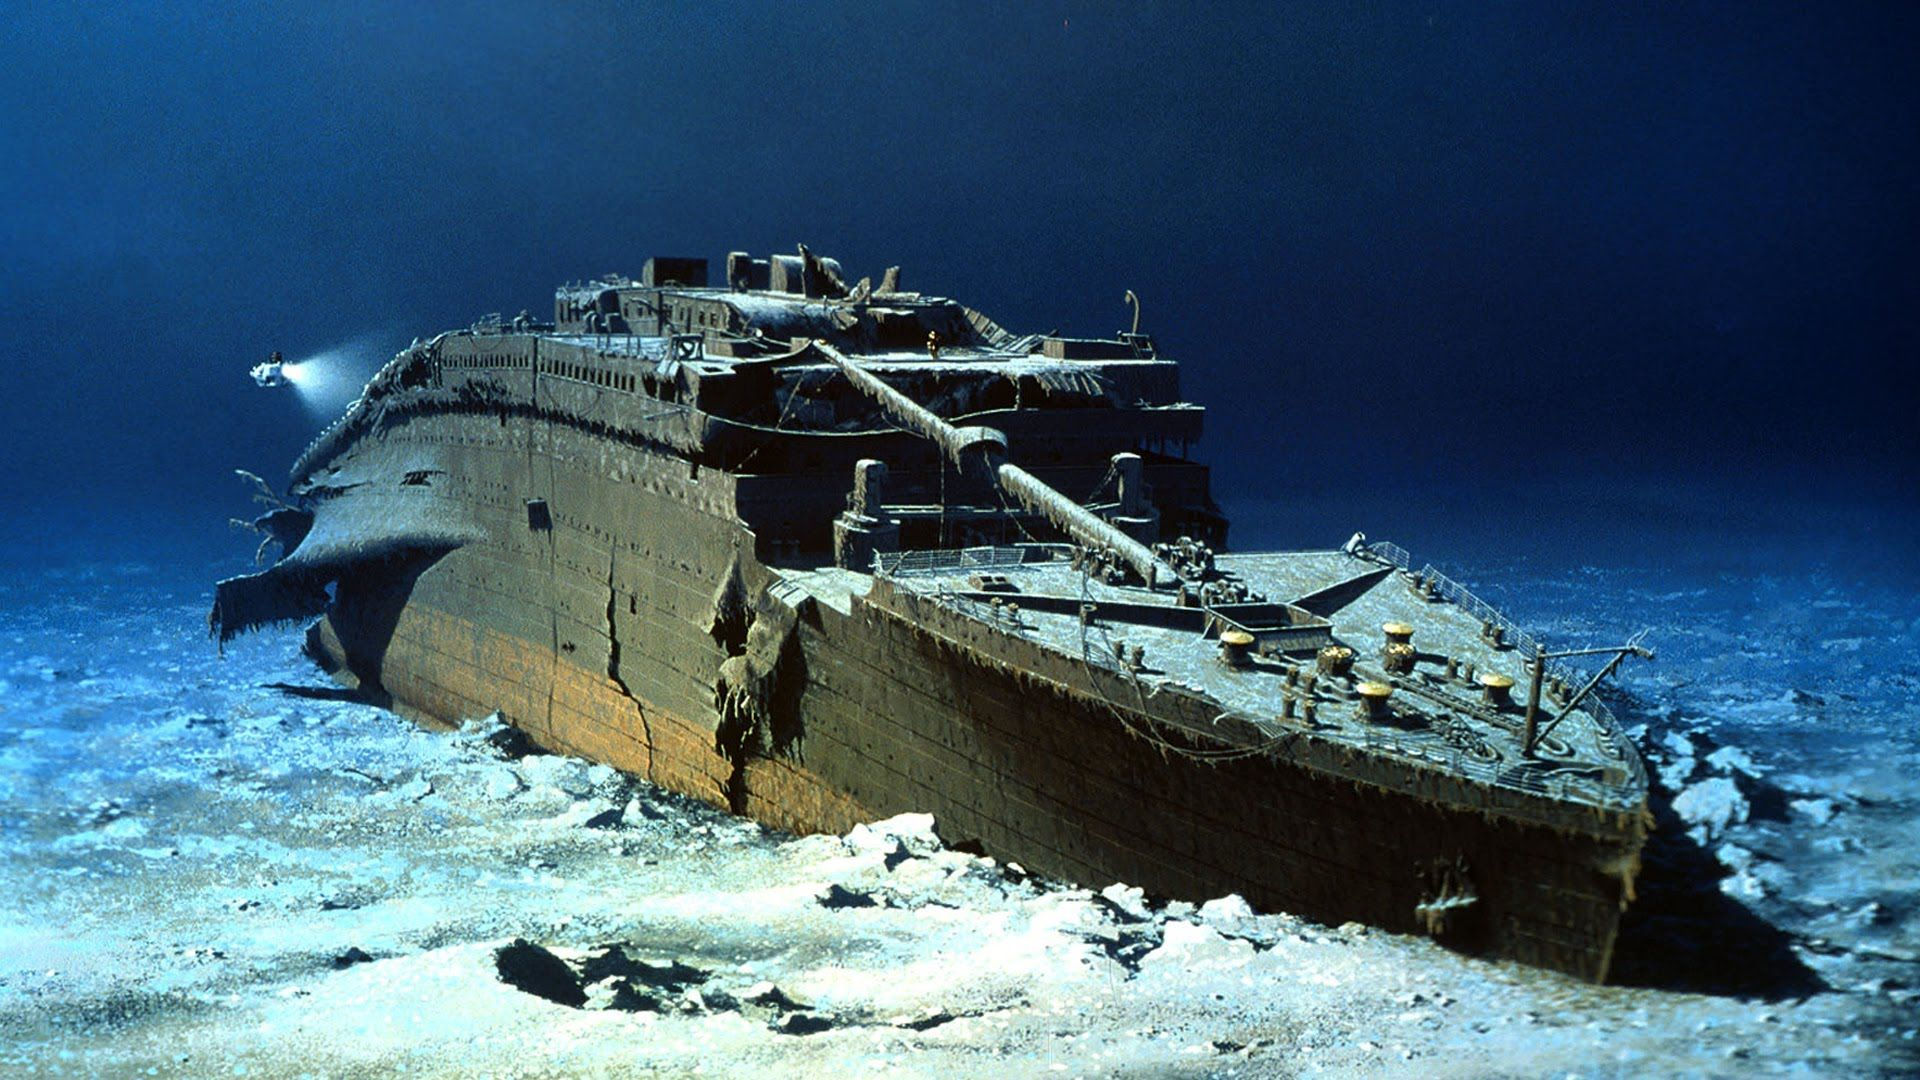 real underwater titanic pictures.  Underwater Robert Ballard Painting The Titanic Via YouTube Intended Real Underwater Titanic Pictures C